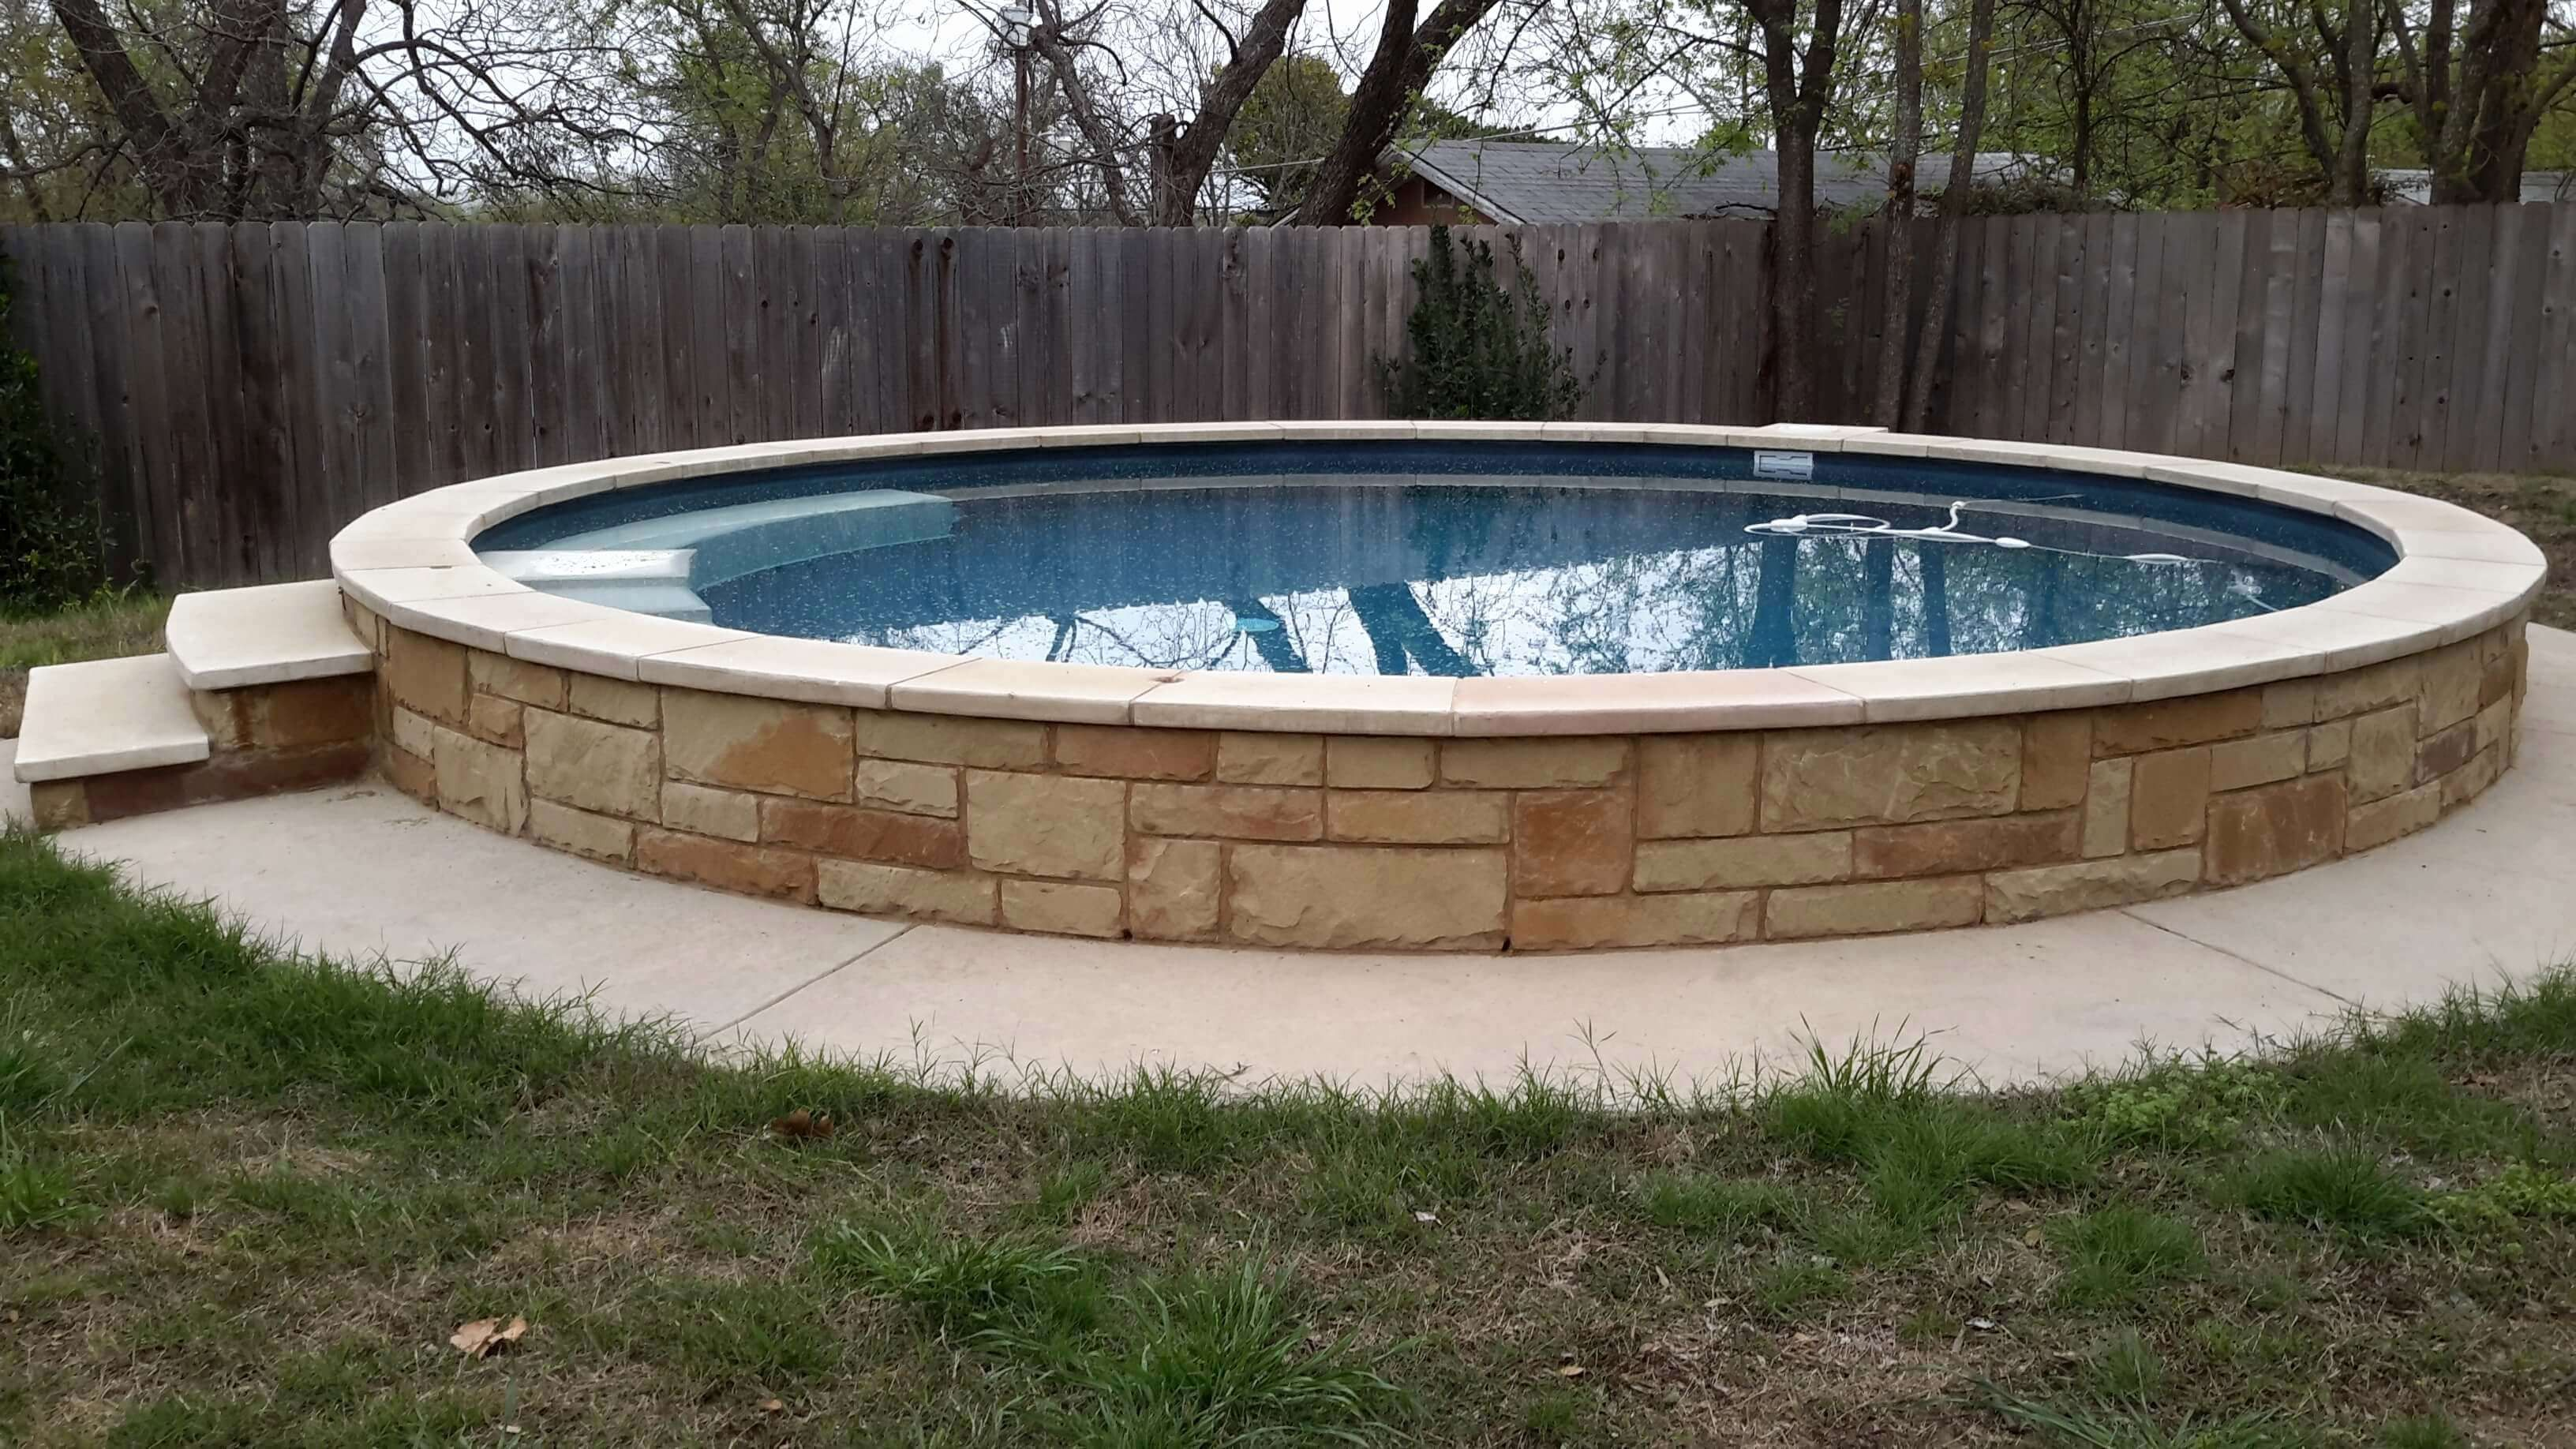 Frisch 40 Fur Whirlpool Umrandung Selber Bauen Check More At Https Www Estadoproperties Com Whirlpool Umrandung Diy Schwimmbad Vorratstank Pool Swimming Pool